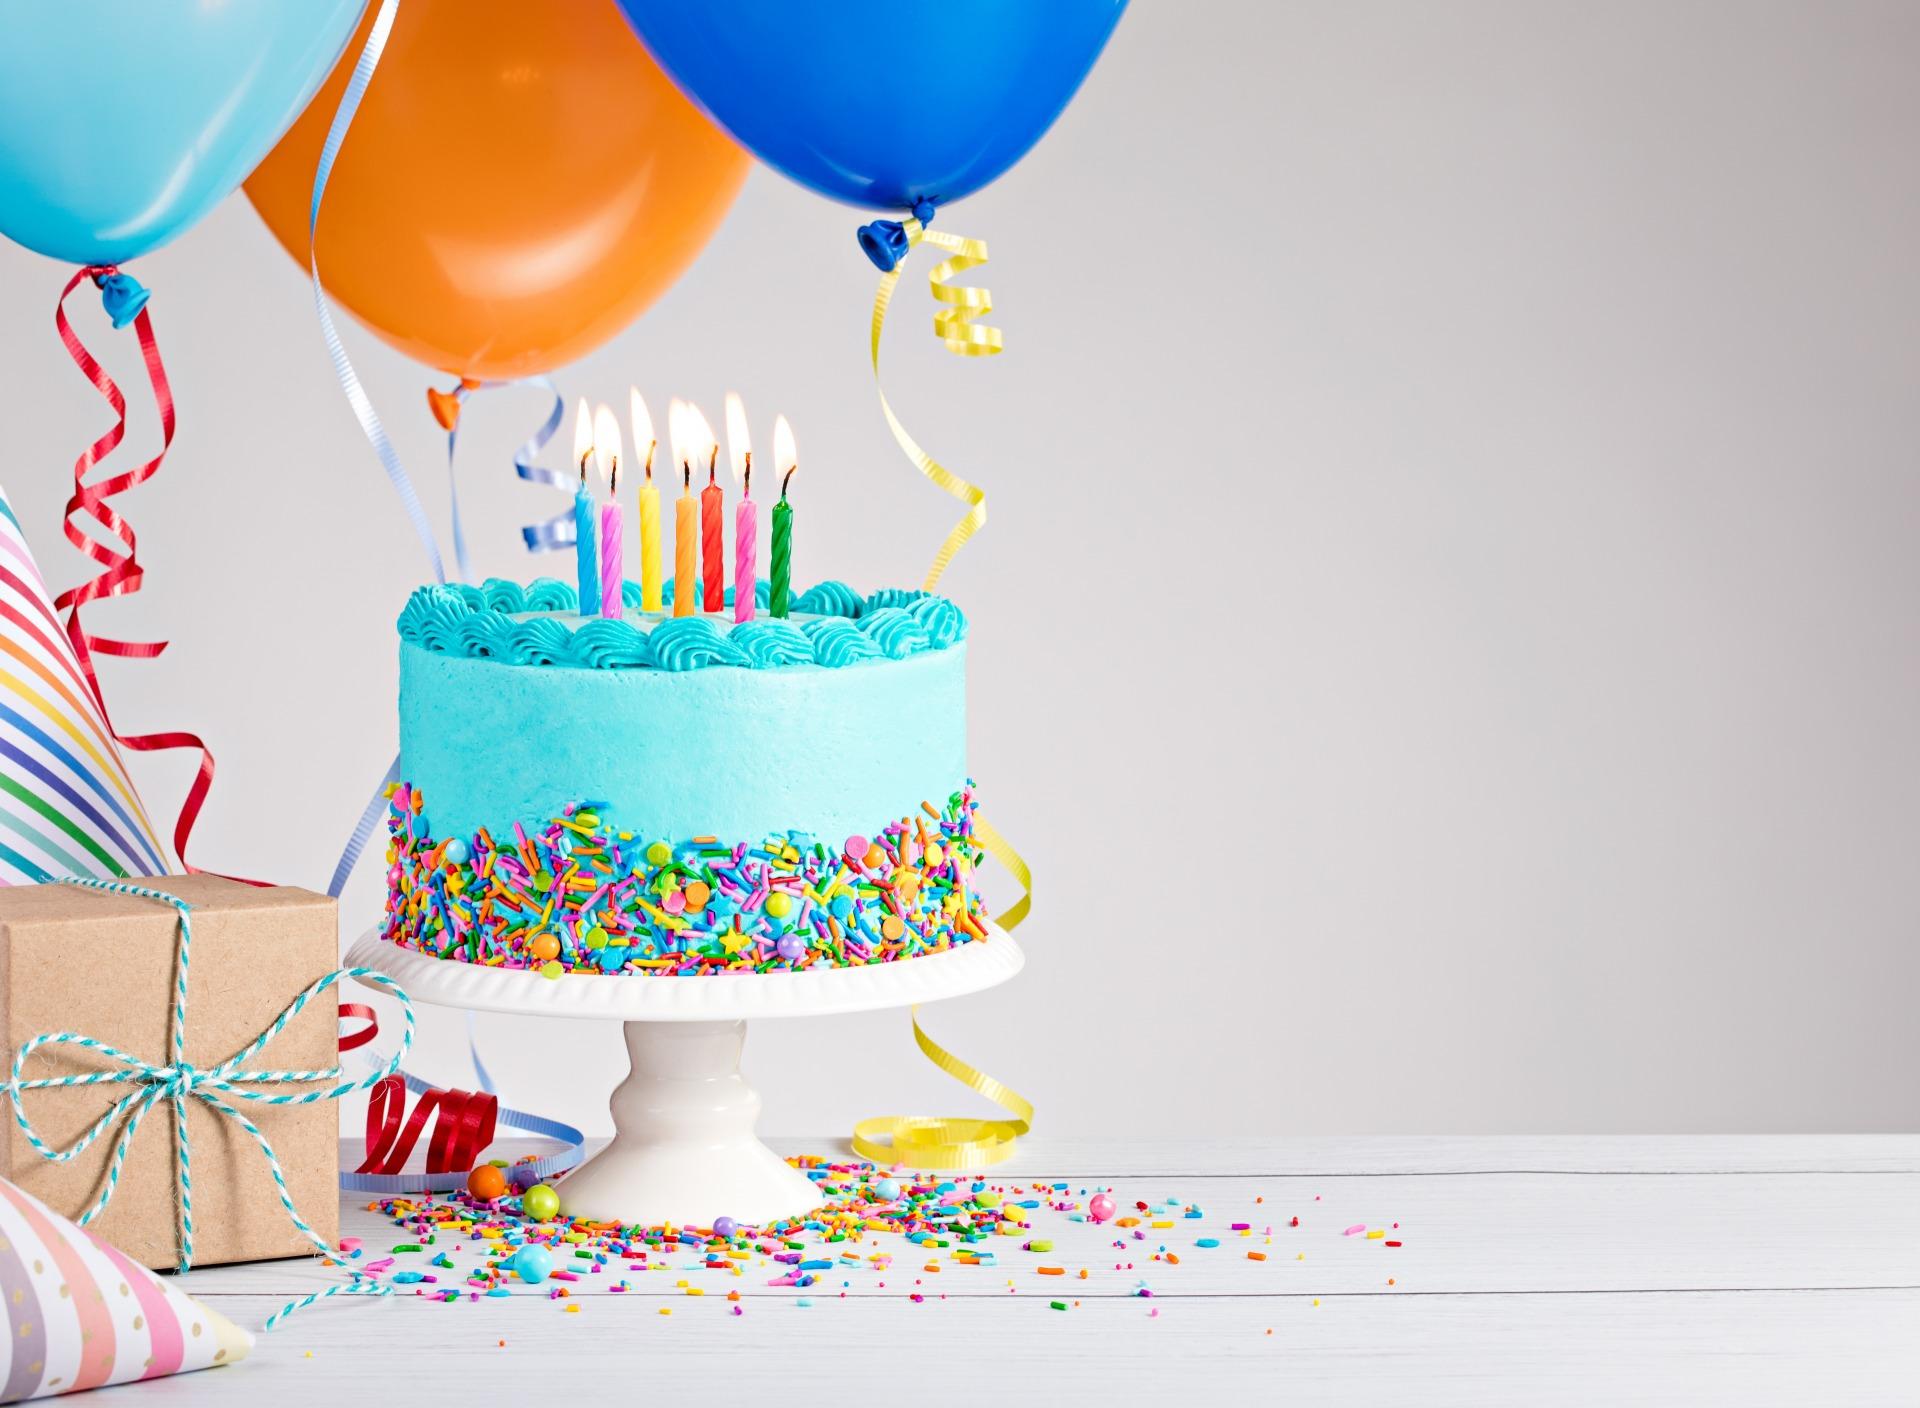 Happy Birthday Cake Candles Colorful Den Rozhdeniia Tort Dec